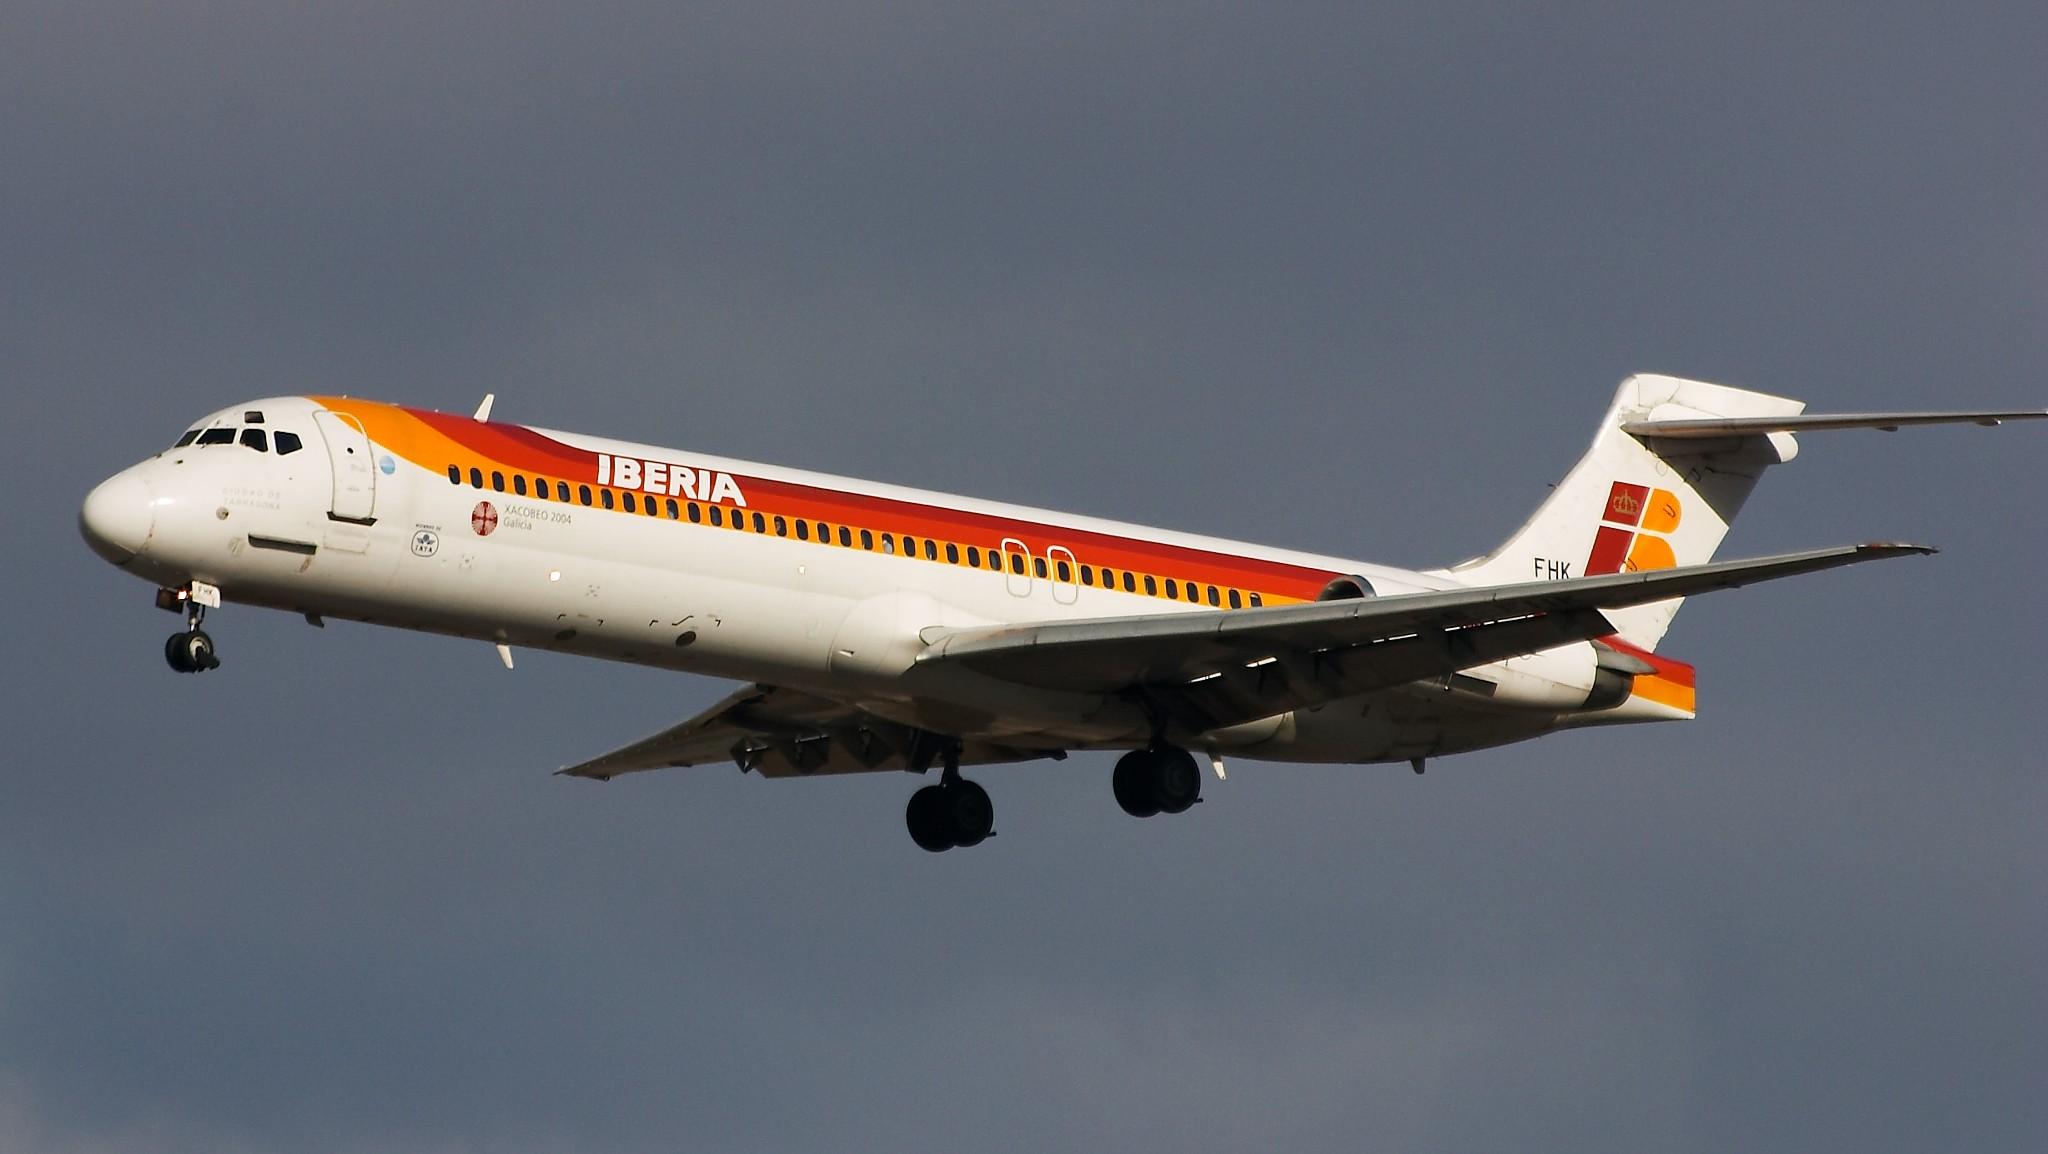 flota de avion iberia: